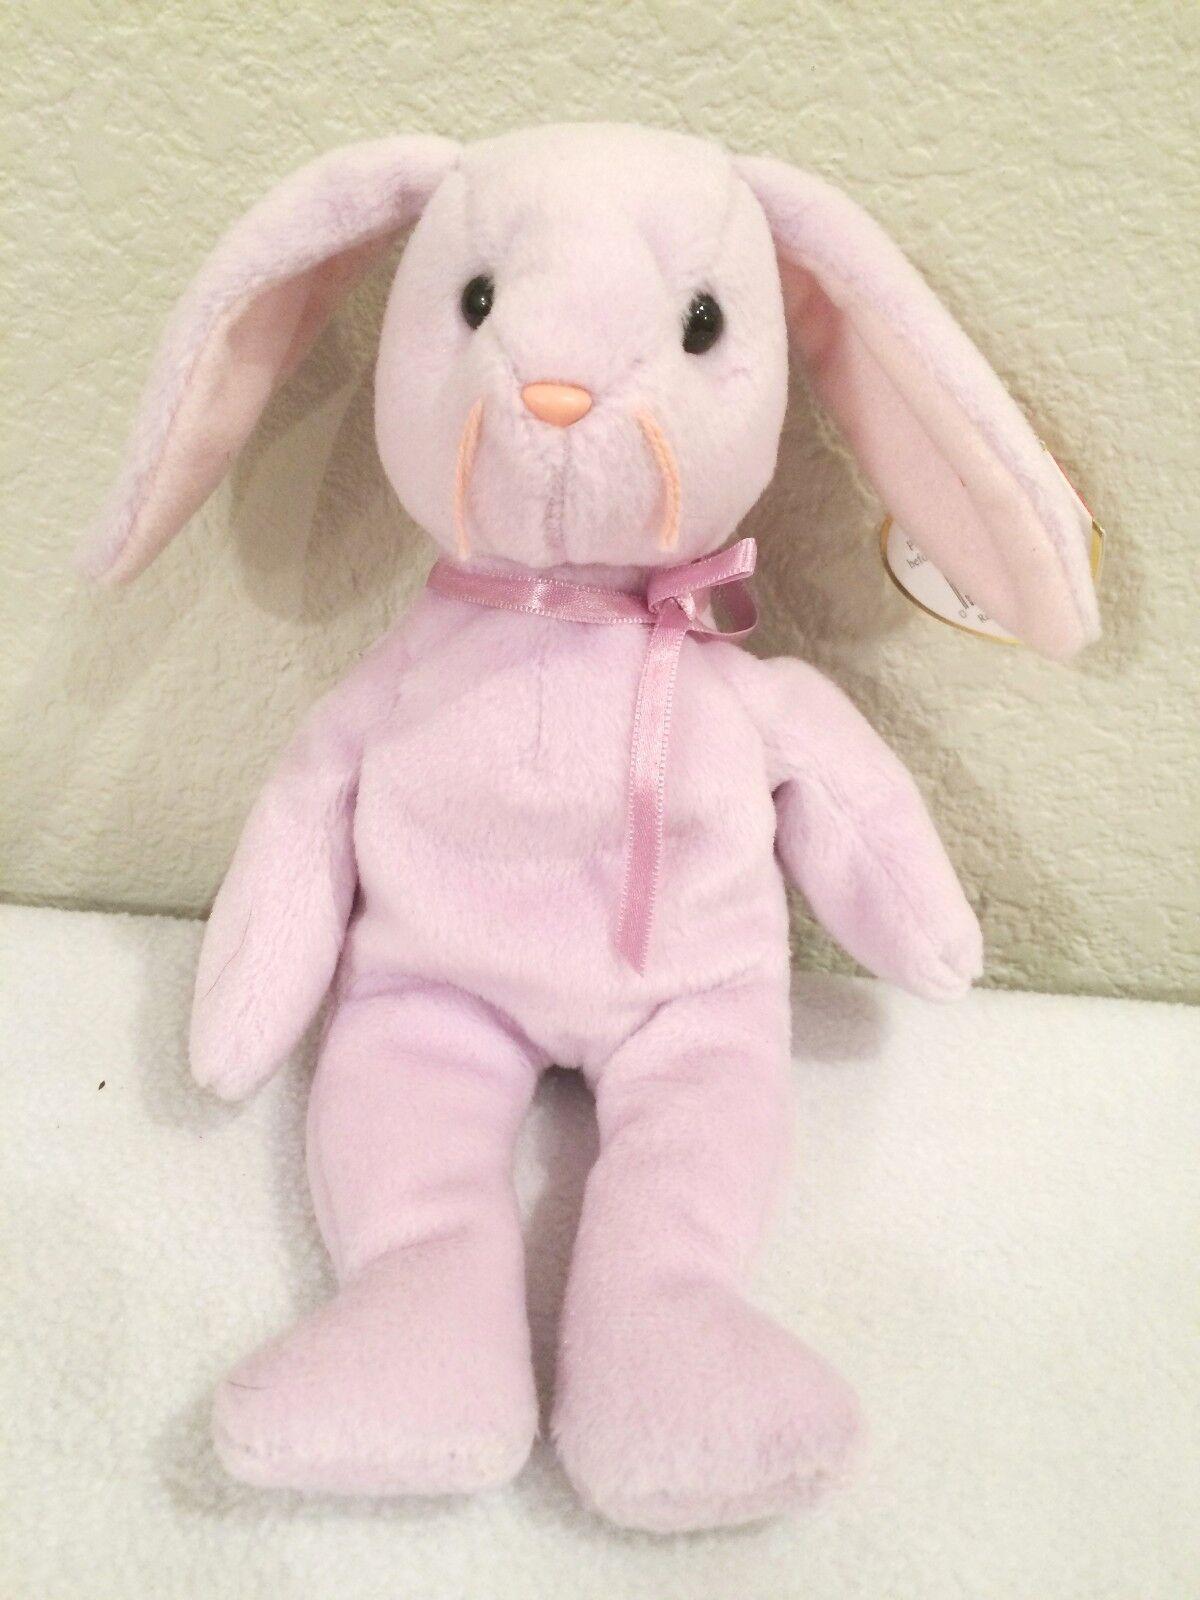 Floppity Bunny TY original beanie baby RETIRED Errors misprints